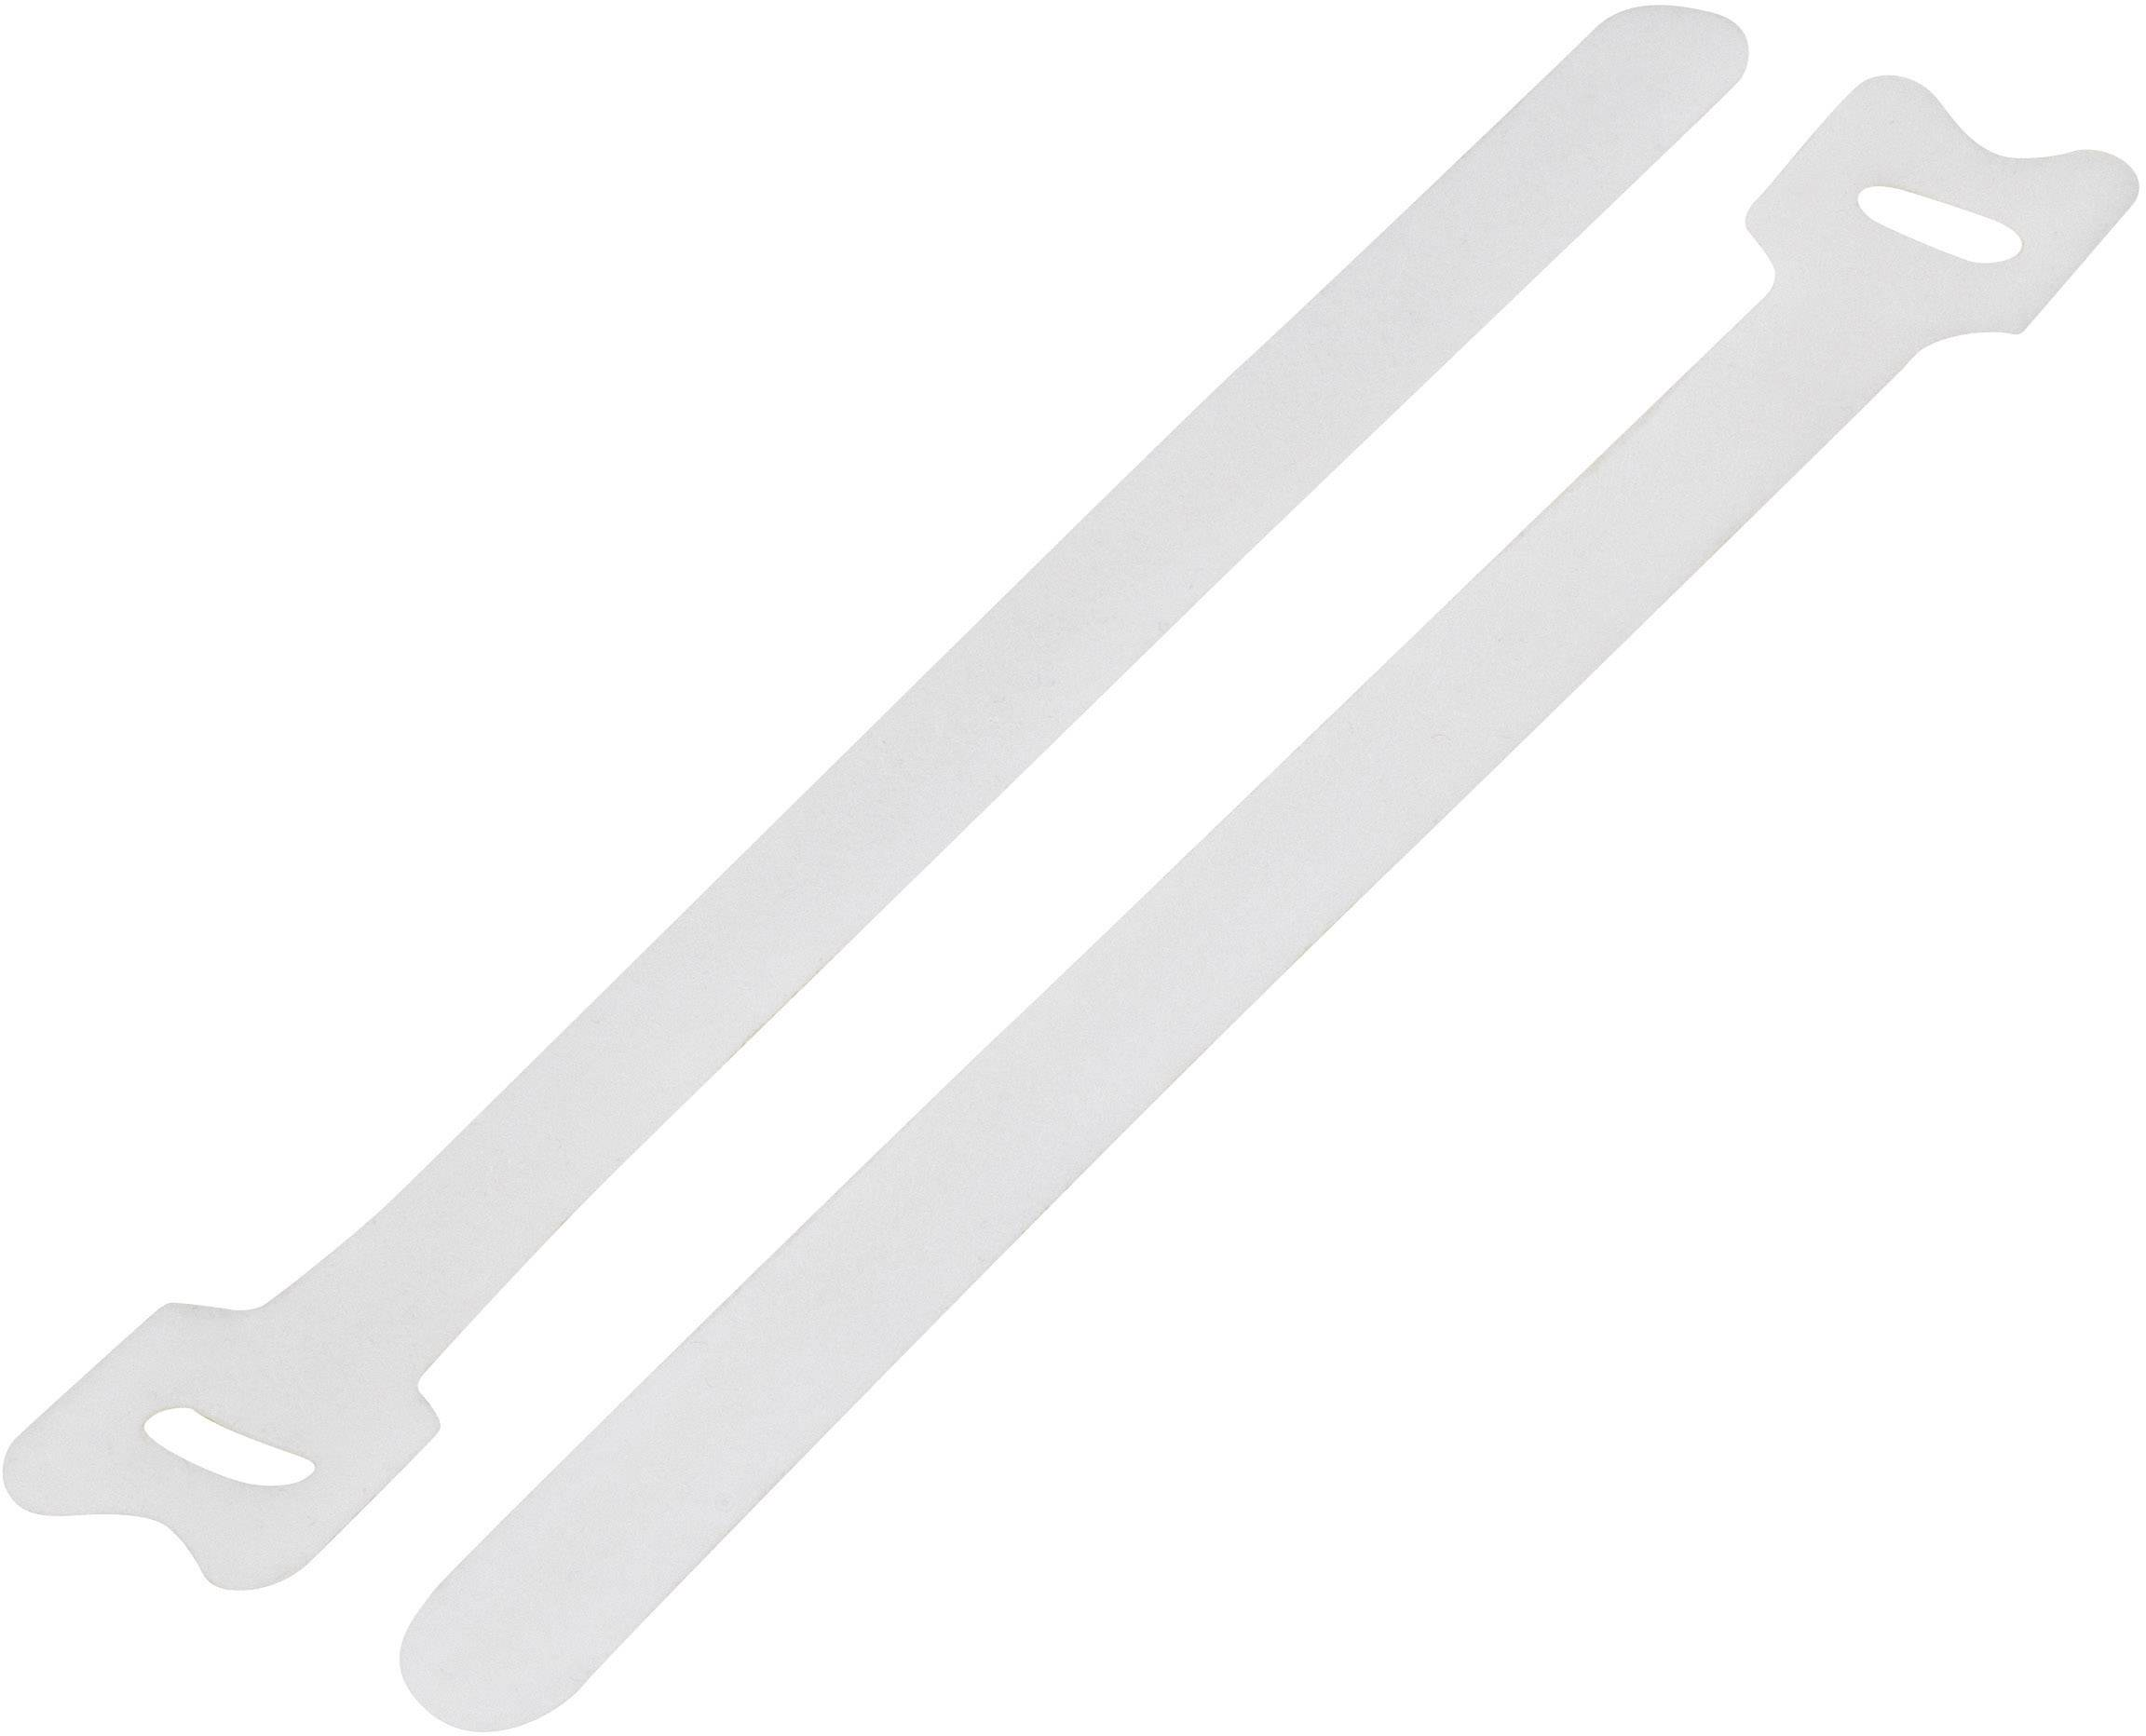 Káblový manažér na suchý zips TRU COMPONENTS TC-MGT-240WE203, (d x š) 240 mm x 16 mm, biela, 1 ks